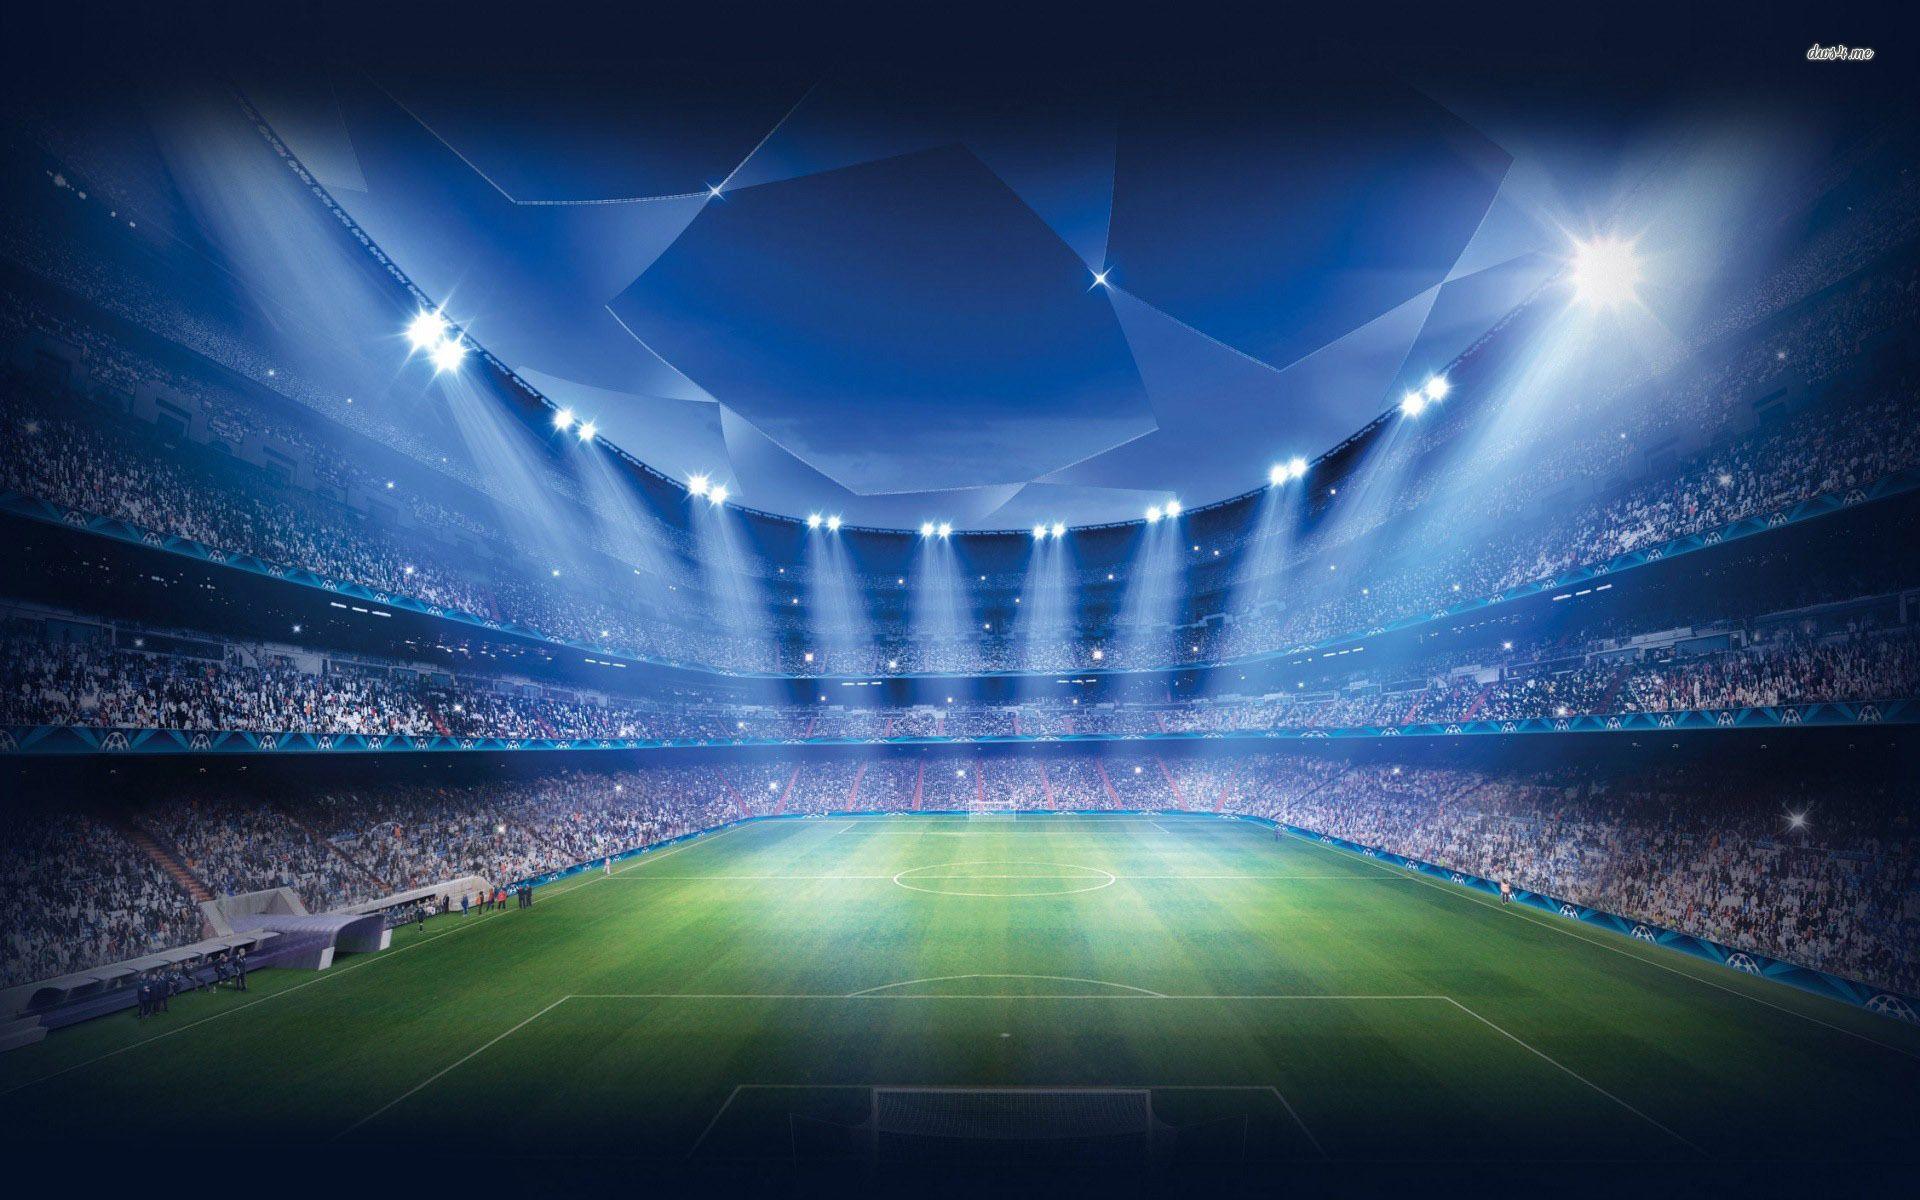 Football Wallpapers Hd   HD Wallpapers   Pinterest   Football wallpaper, Wallpaper and Wallpaper ...